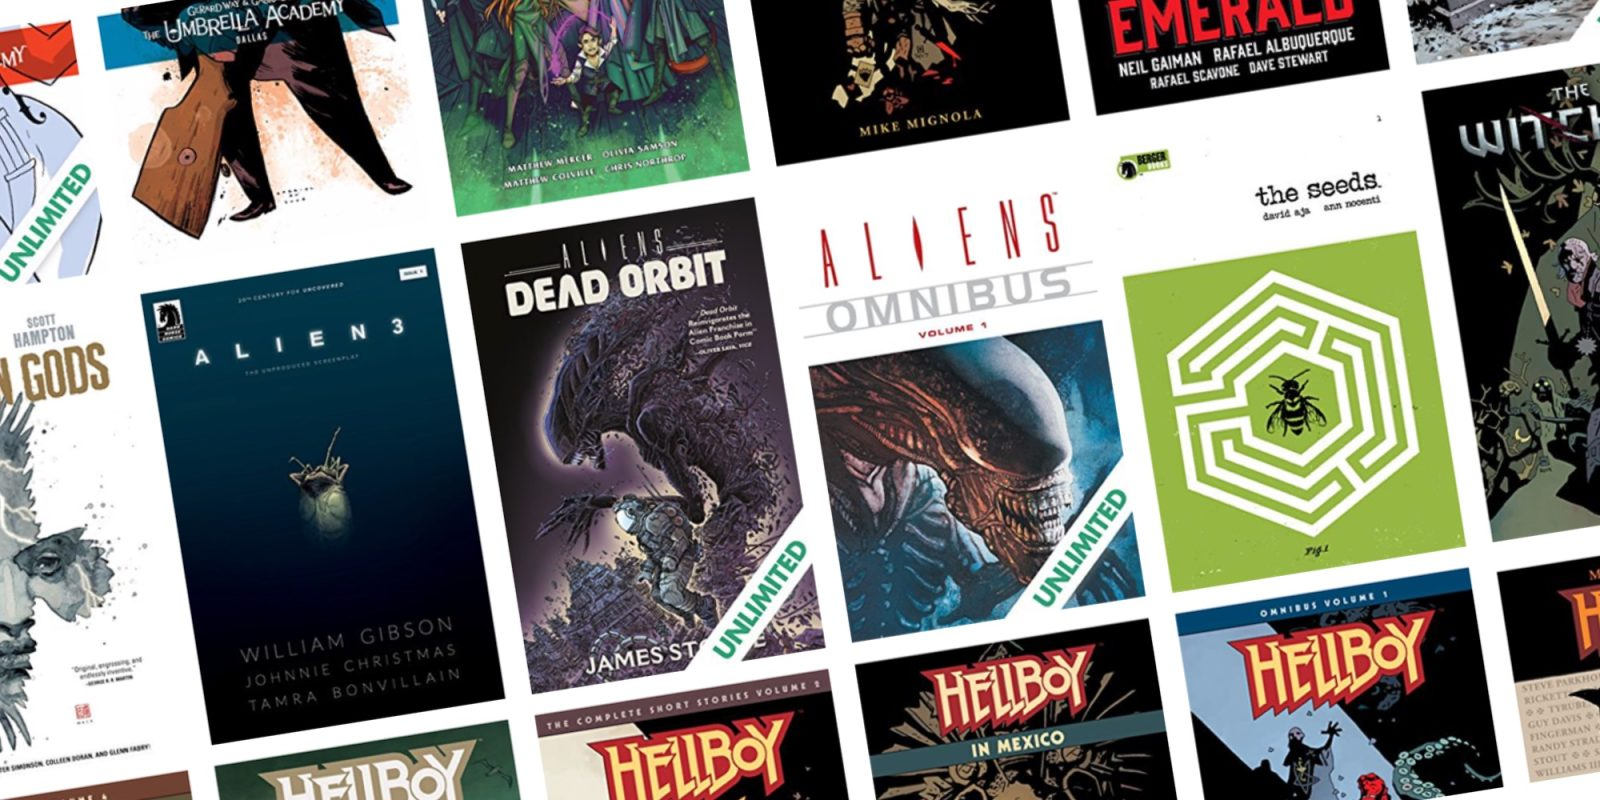 ComiXology slashes 50% off its Dark Horse digital comics from under $1